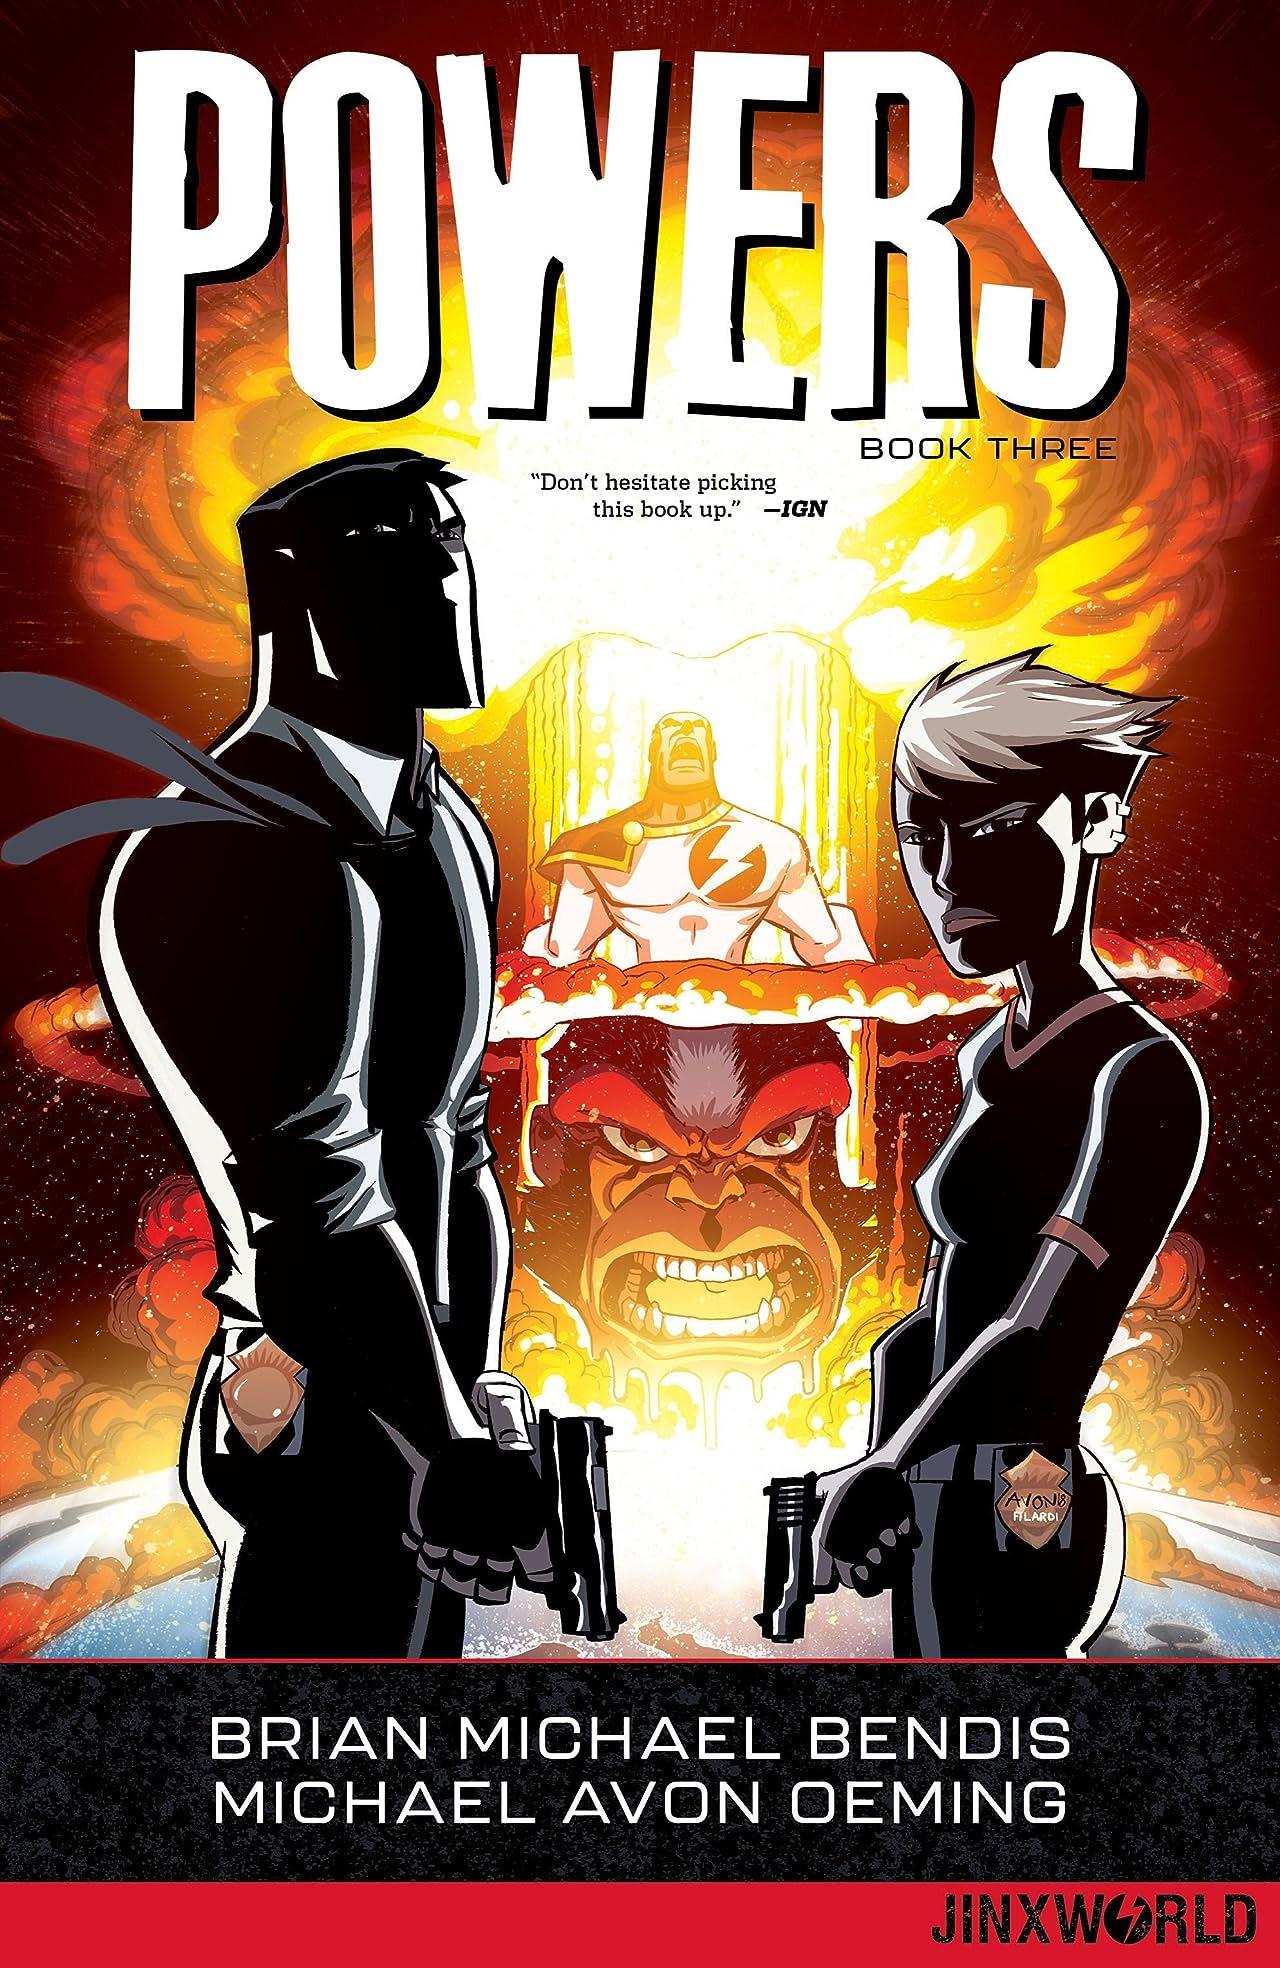 Powers Book Three